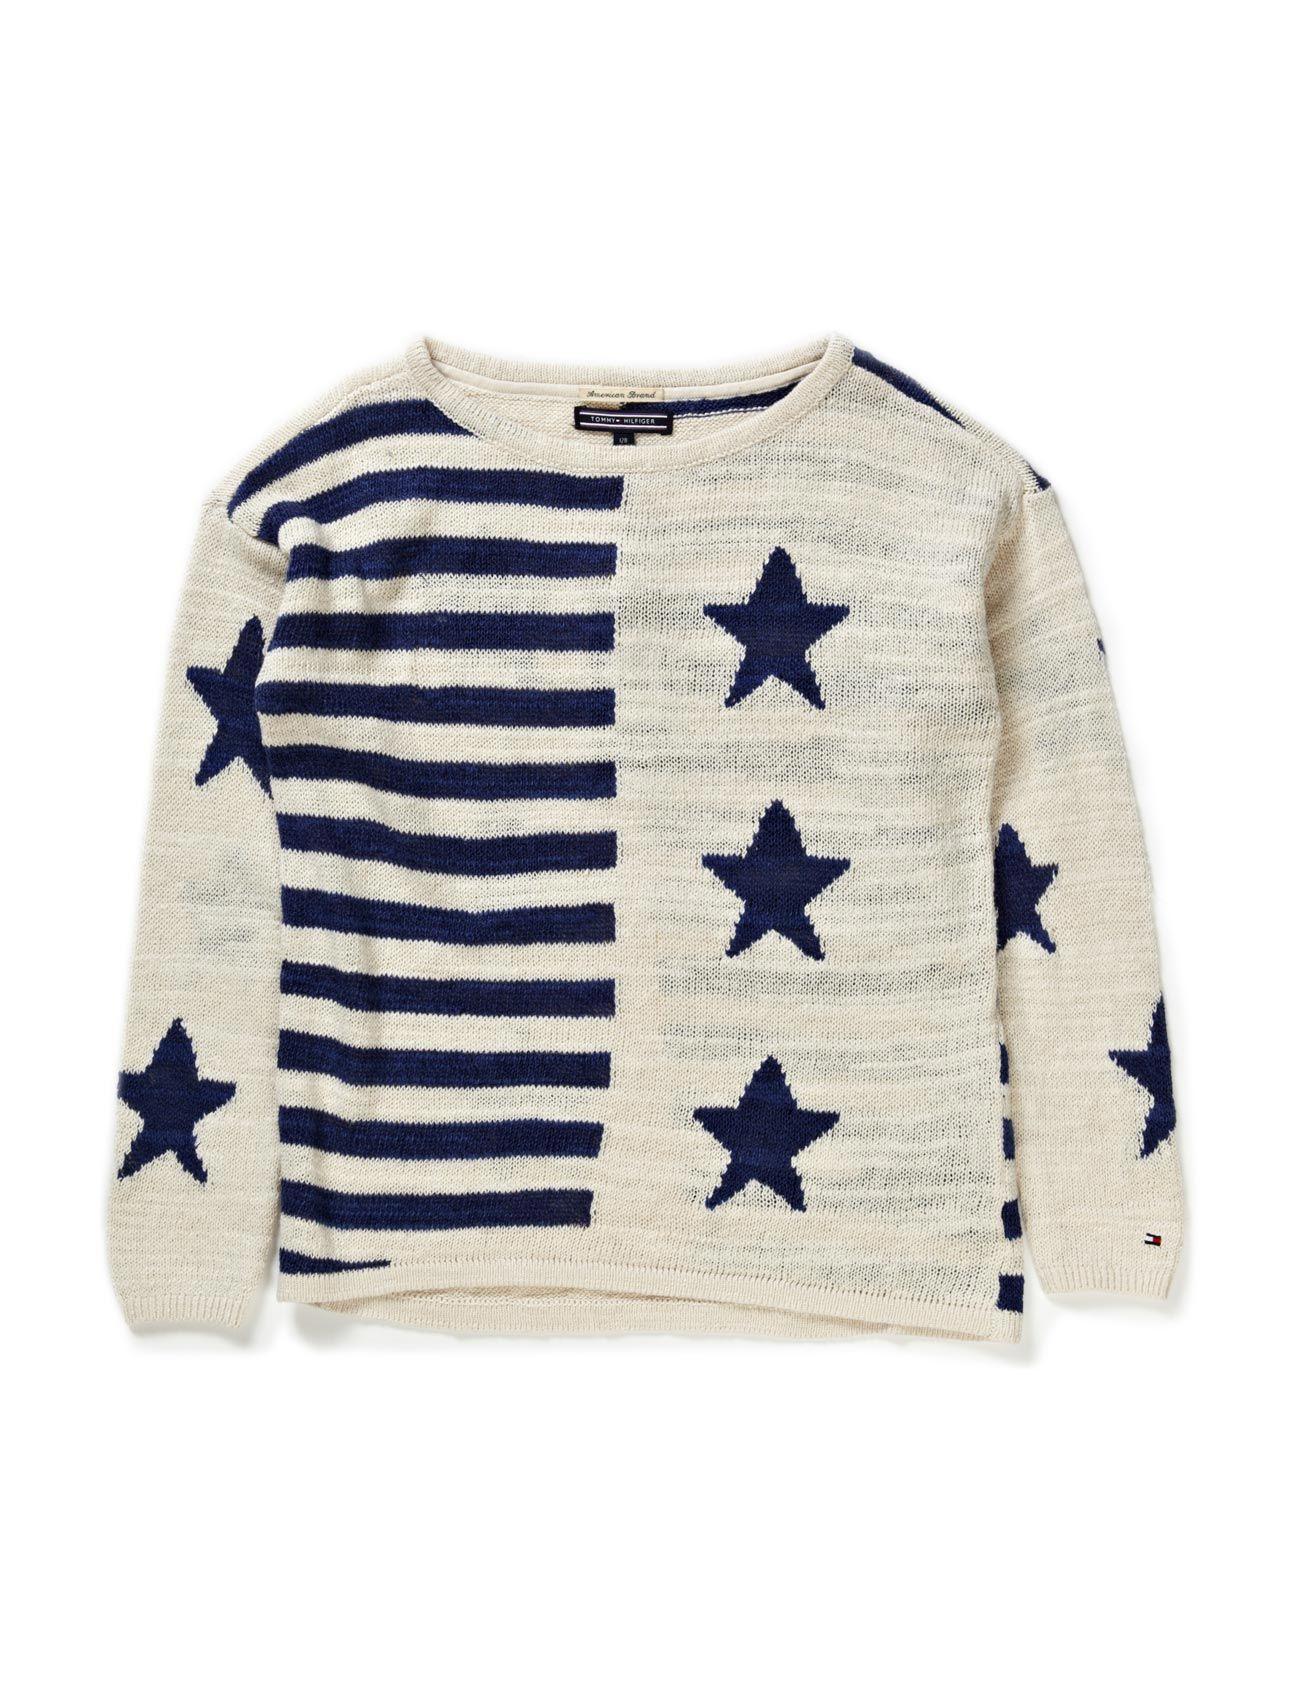 Lina Cn Sweater L/S